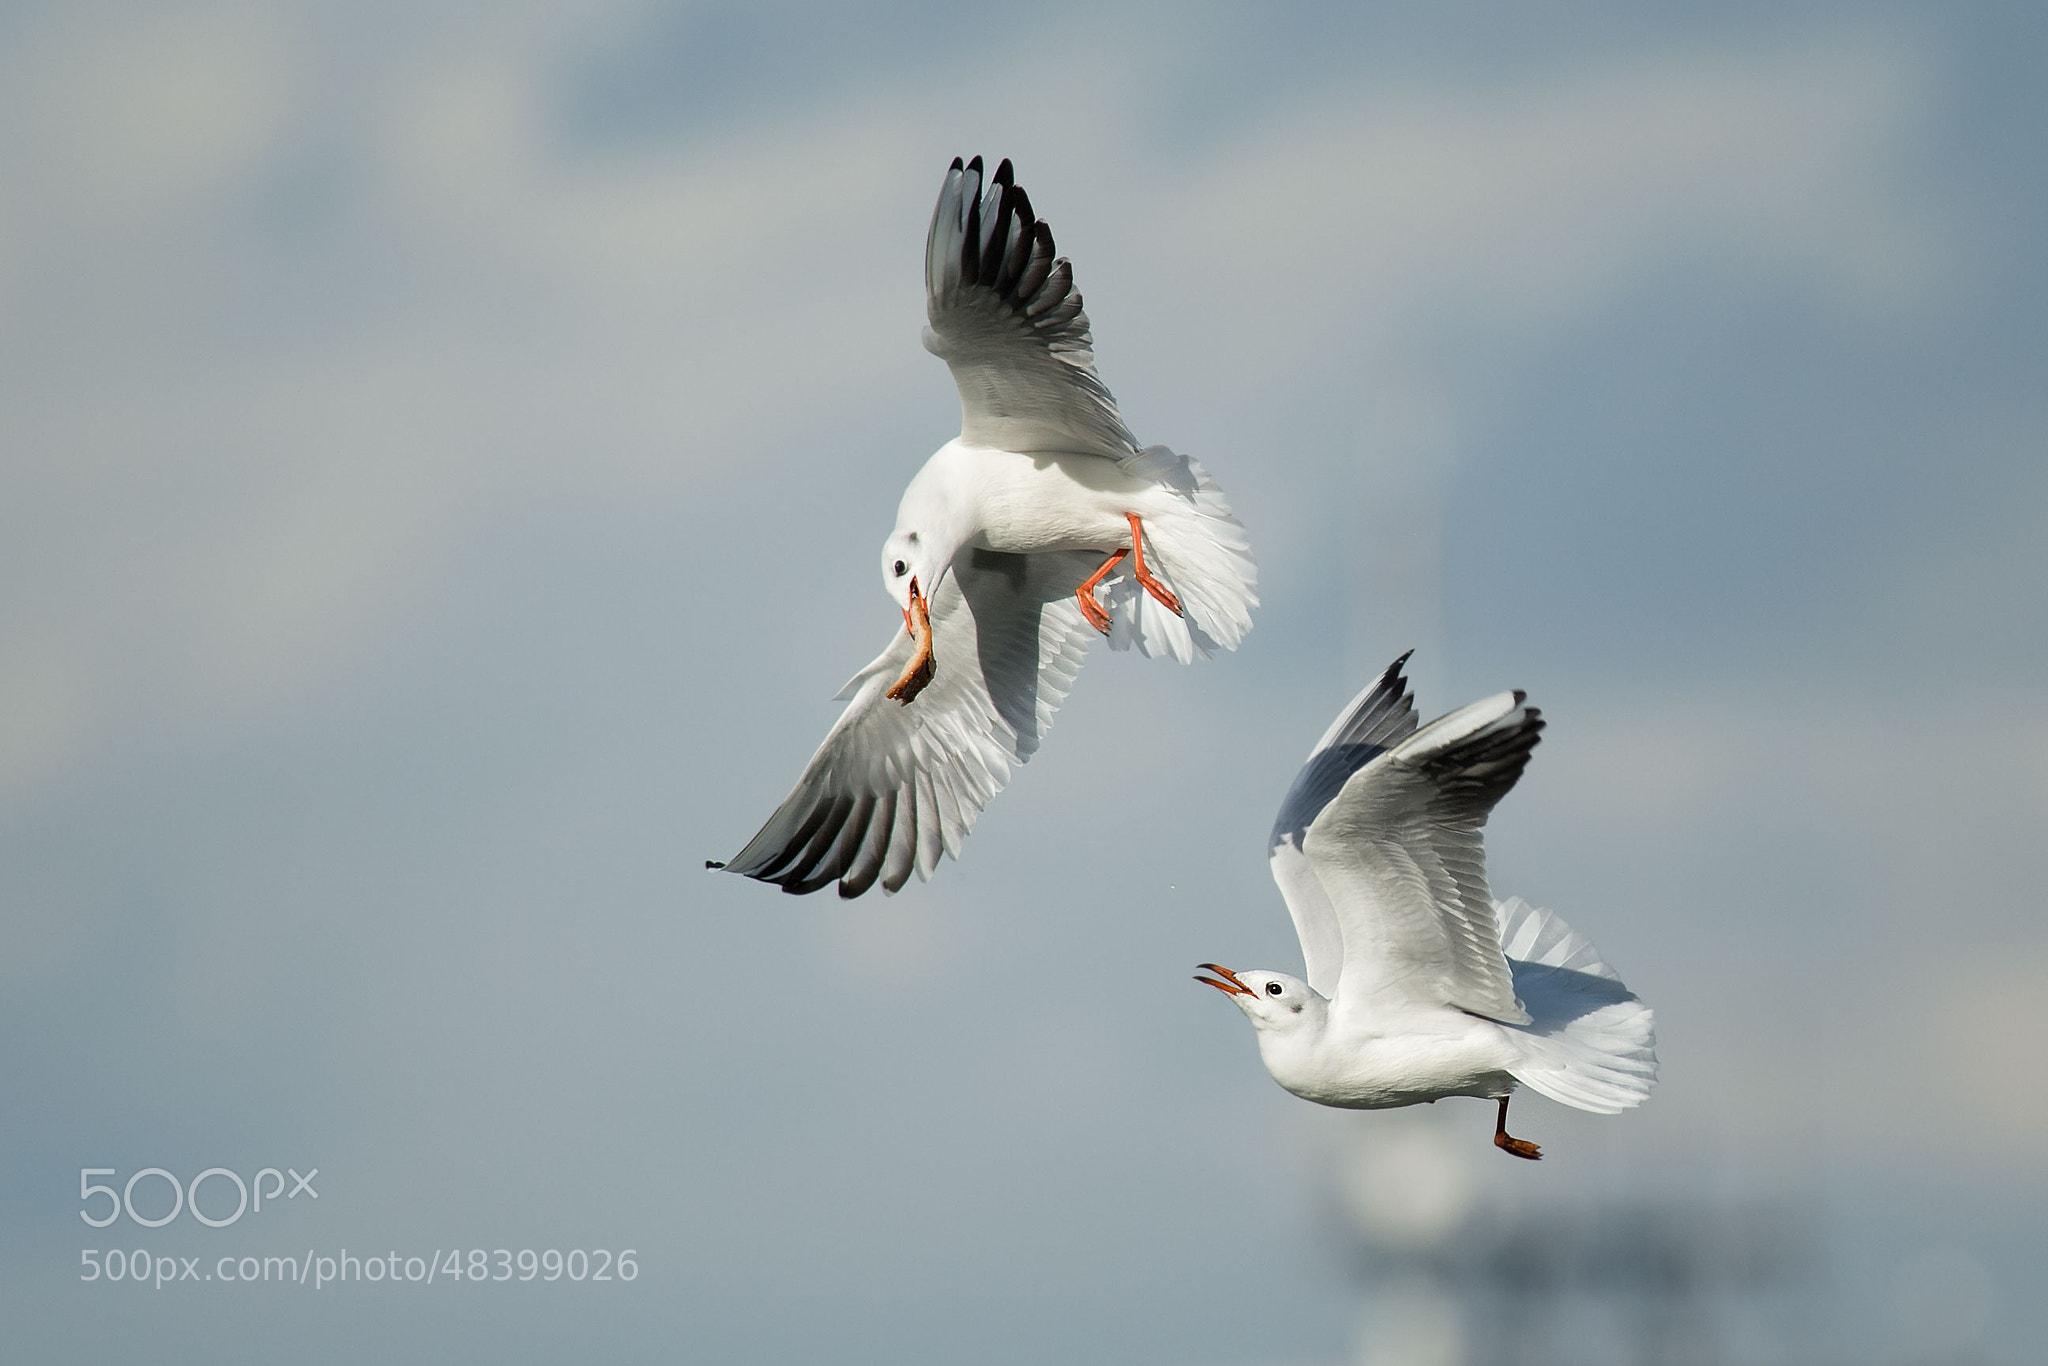 Photograph Kämpfende Möwen | Fighting seagulls by Franz Engels on 500px